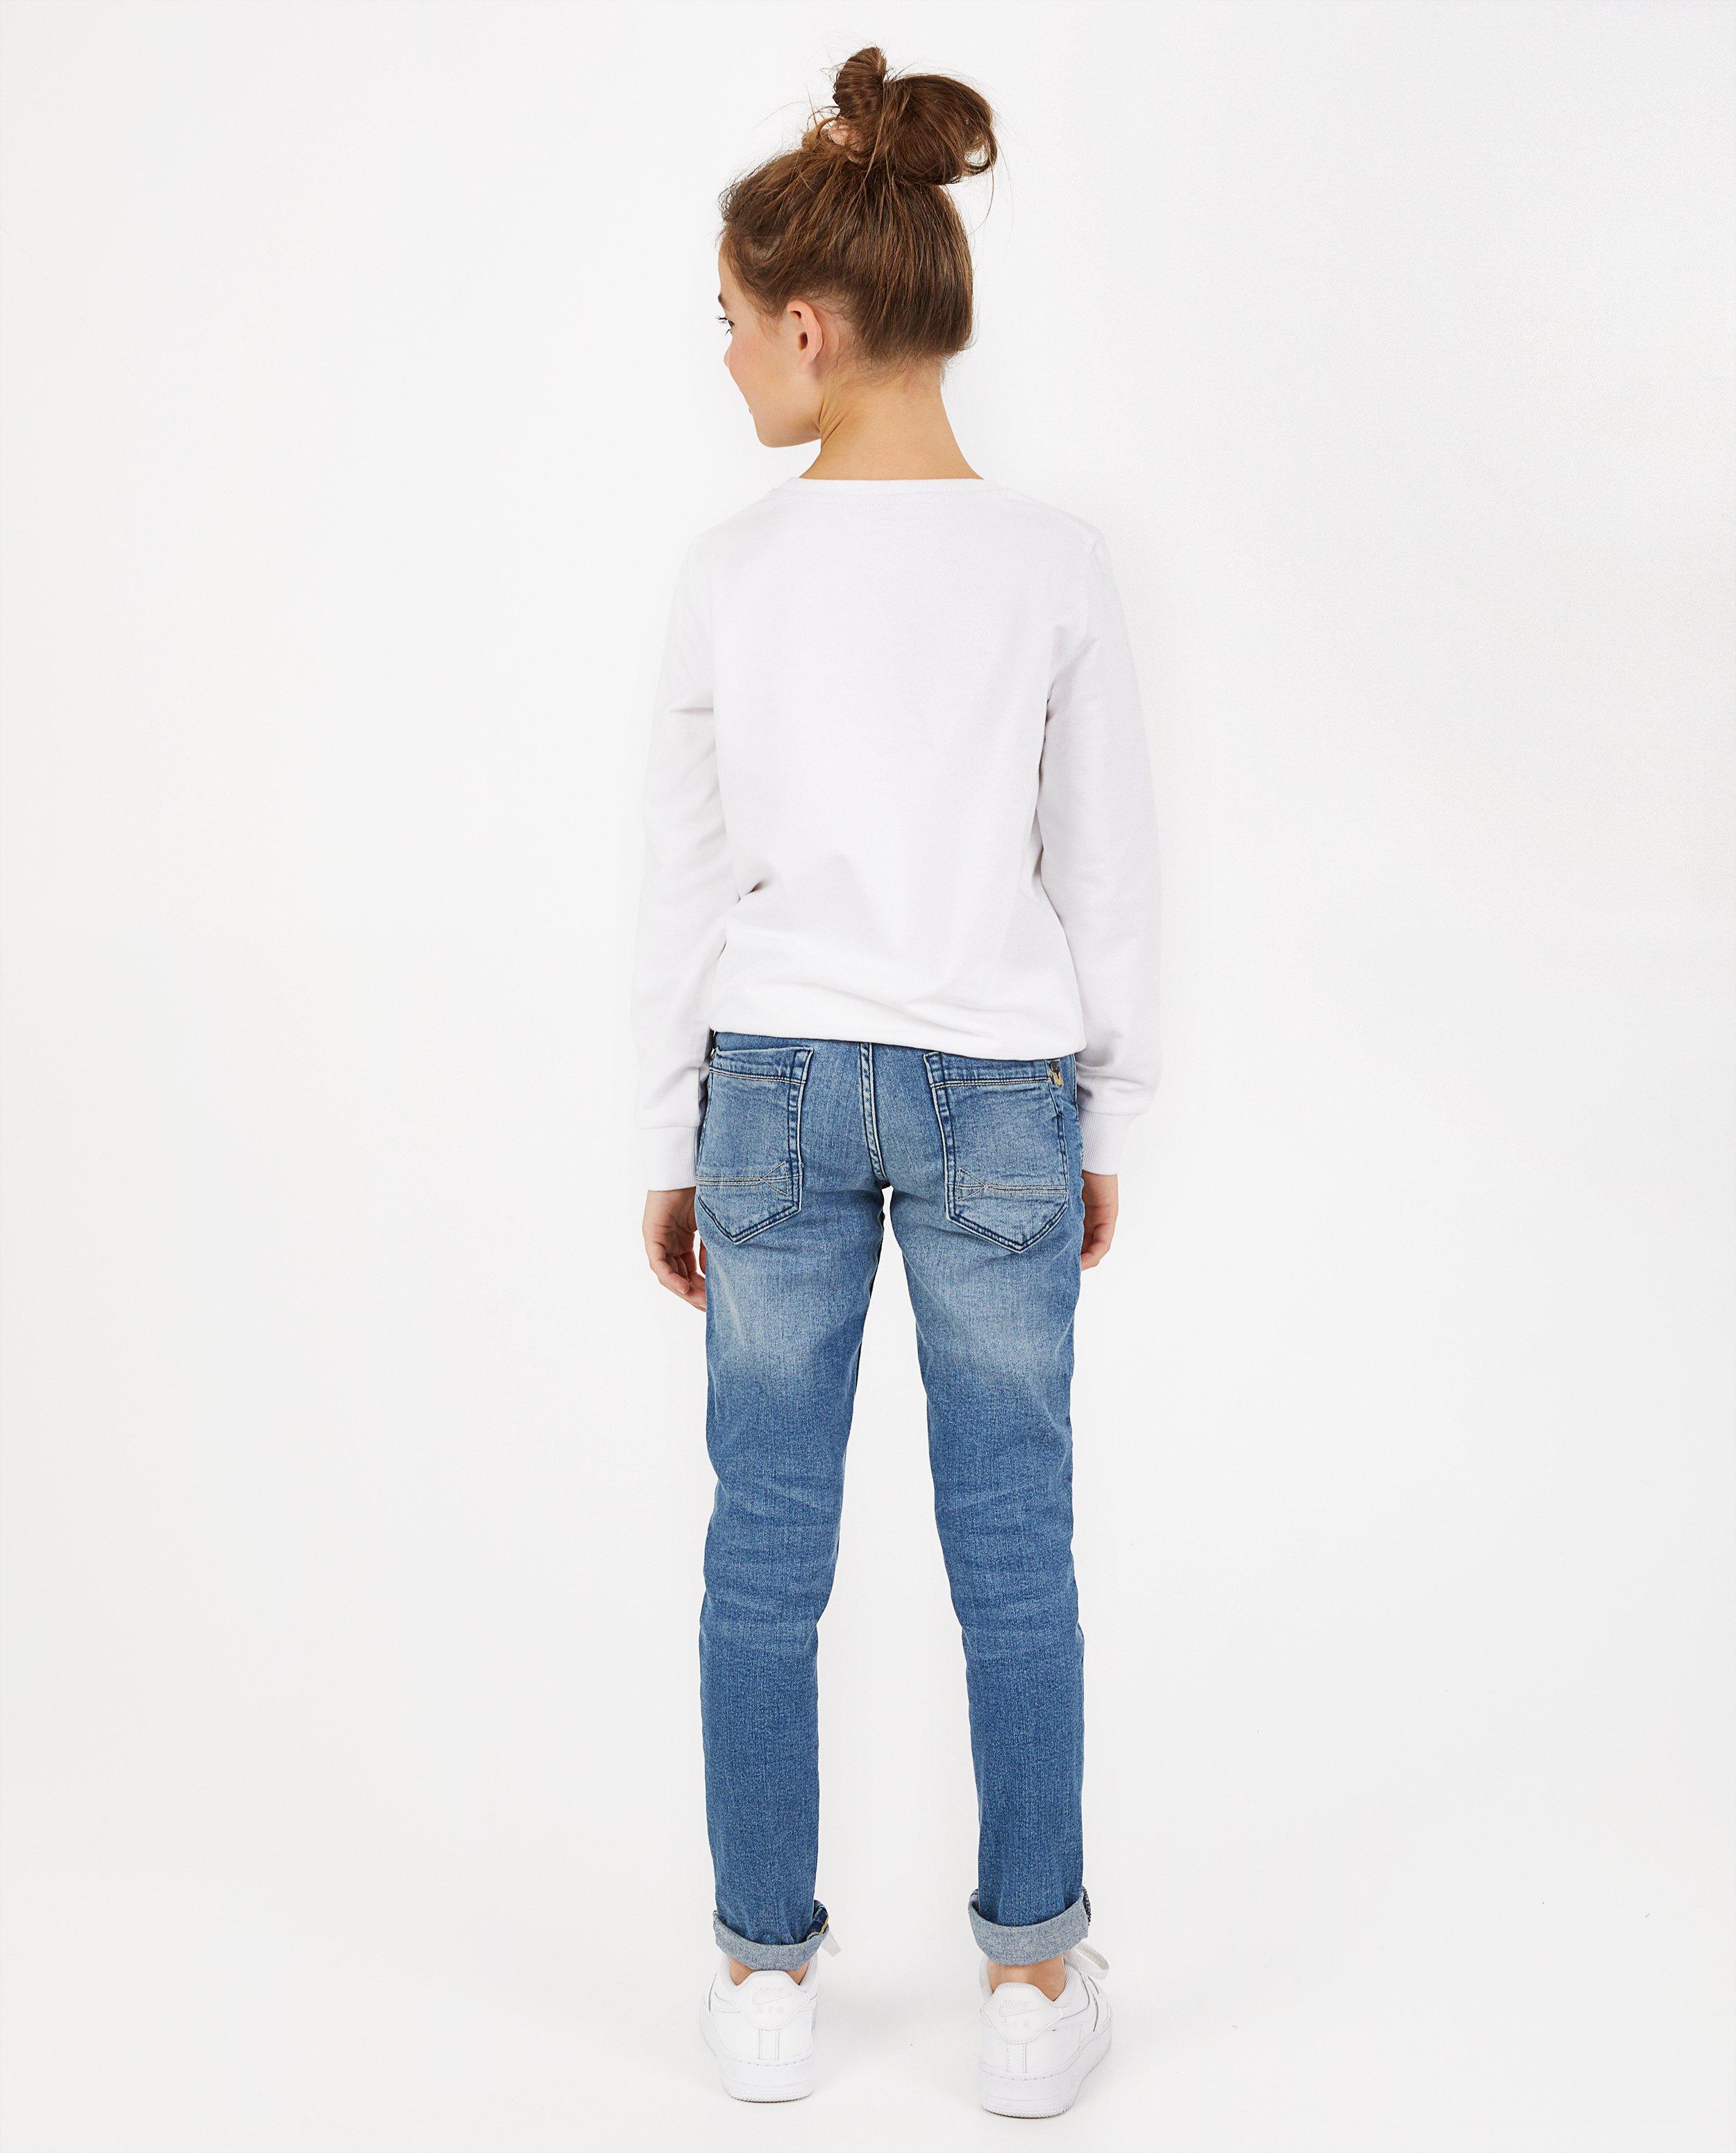 Sweaters - Witte sweater met print #LikeMe